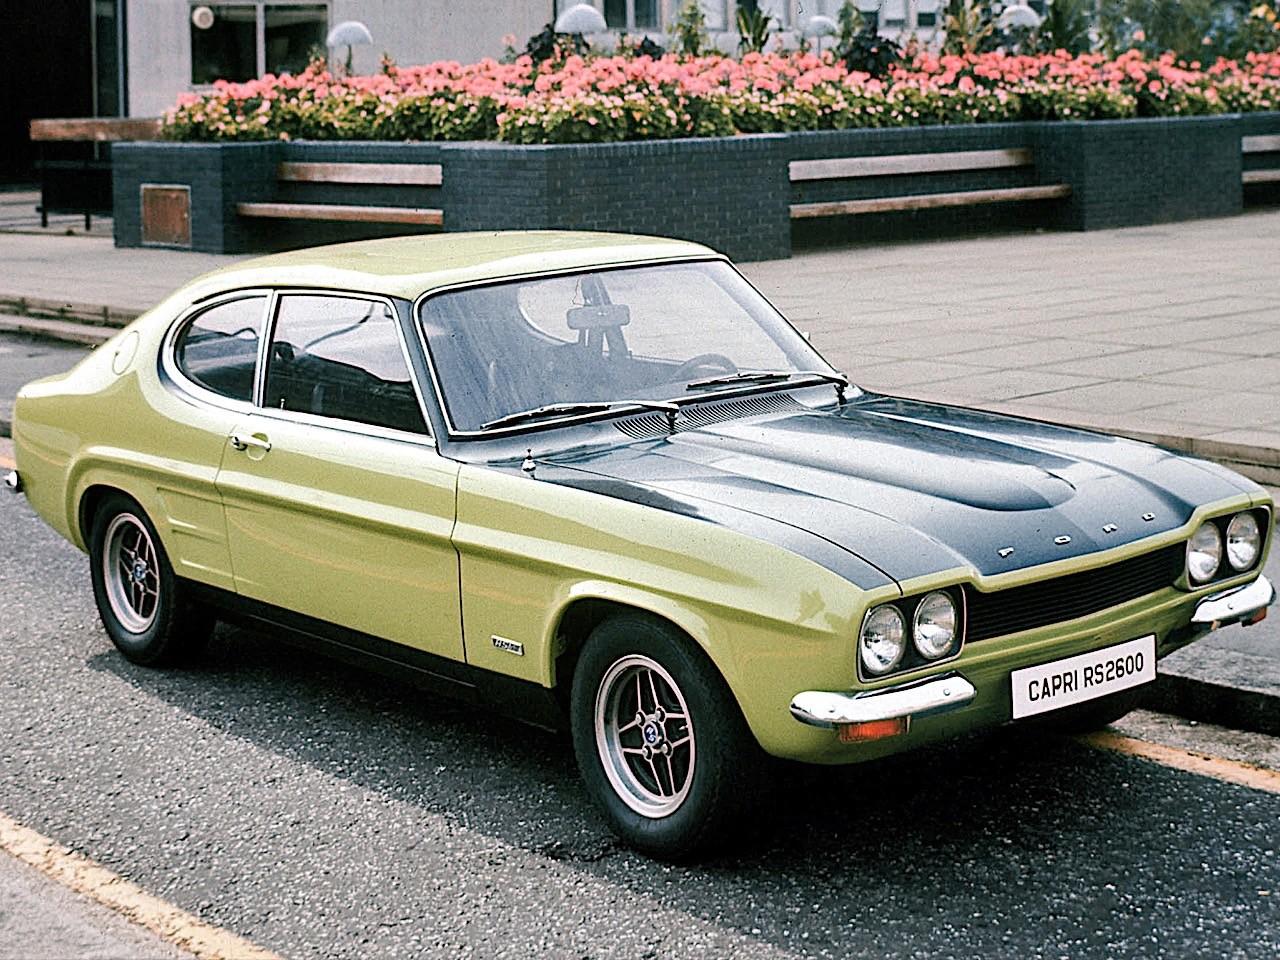 Ford Capri Specs Photos 1969 1970 1971 1972 1973 1974